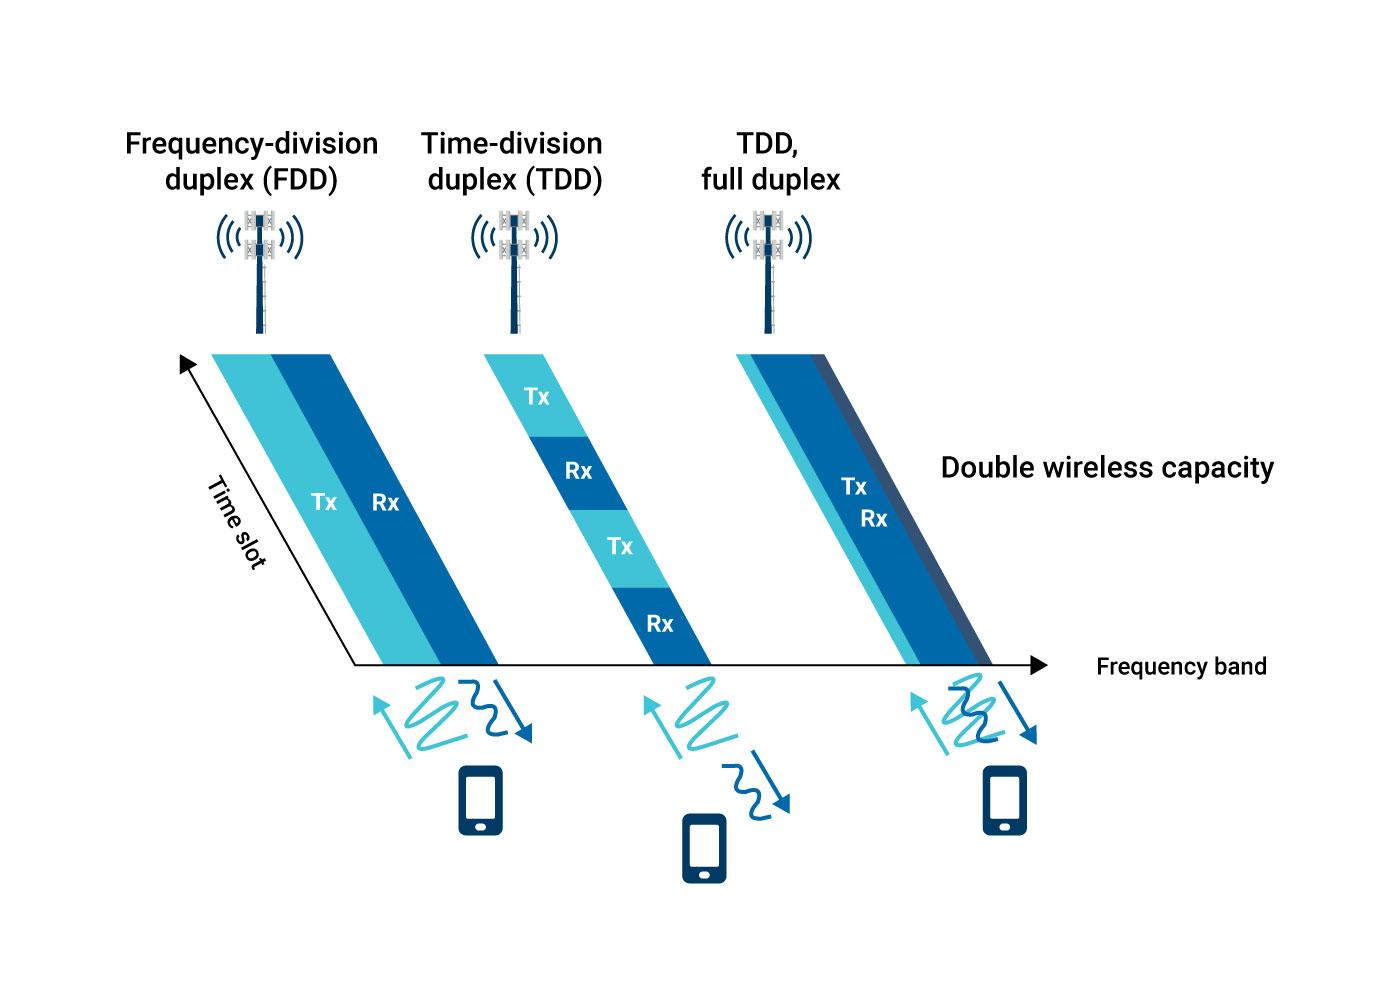 Figure 4. Differences between FDD, TDD and TDD full duplex.